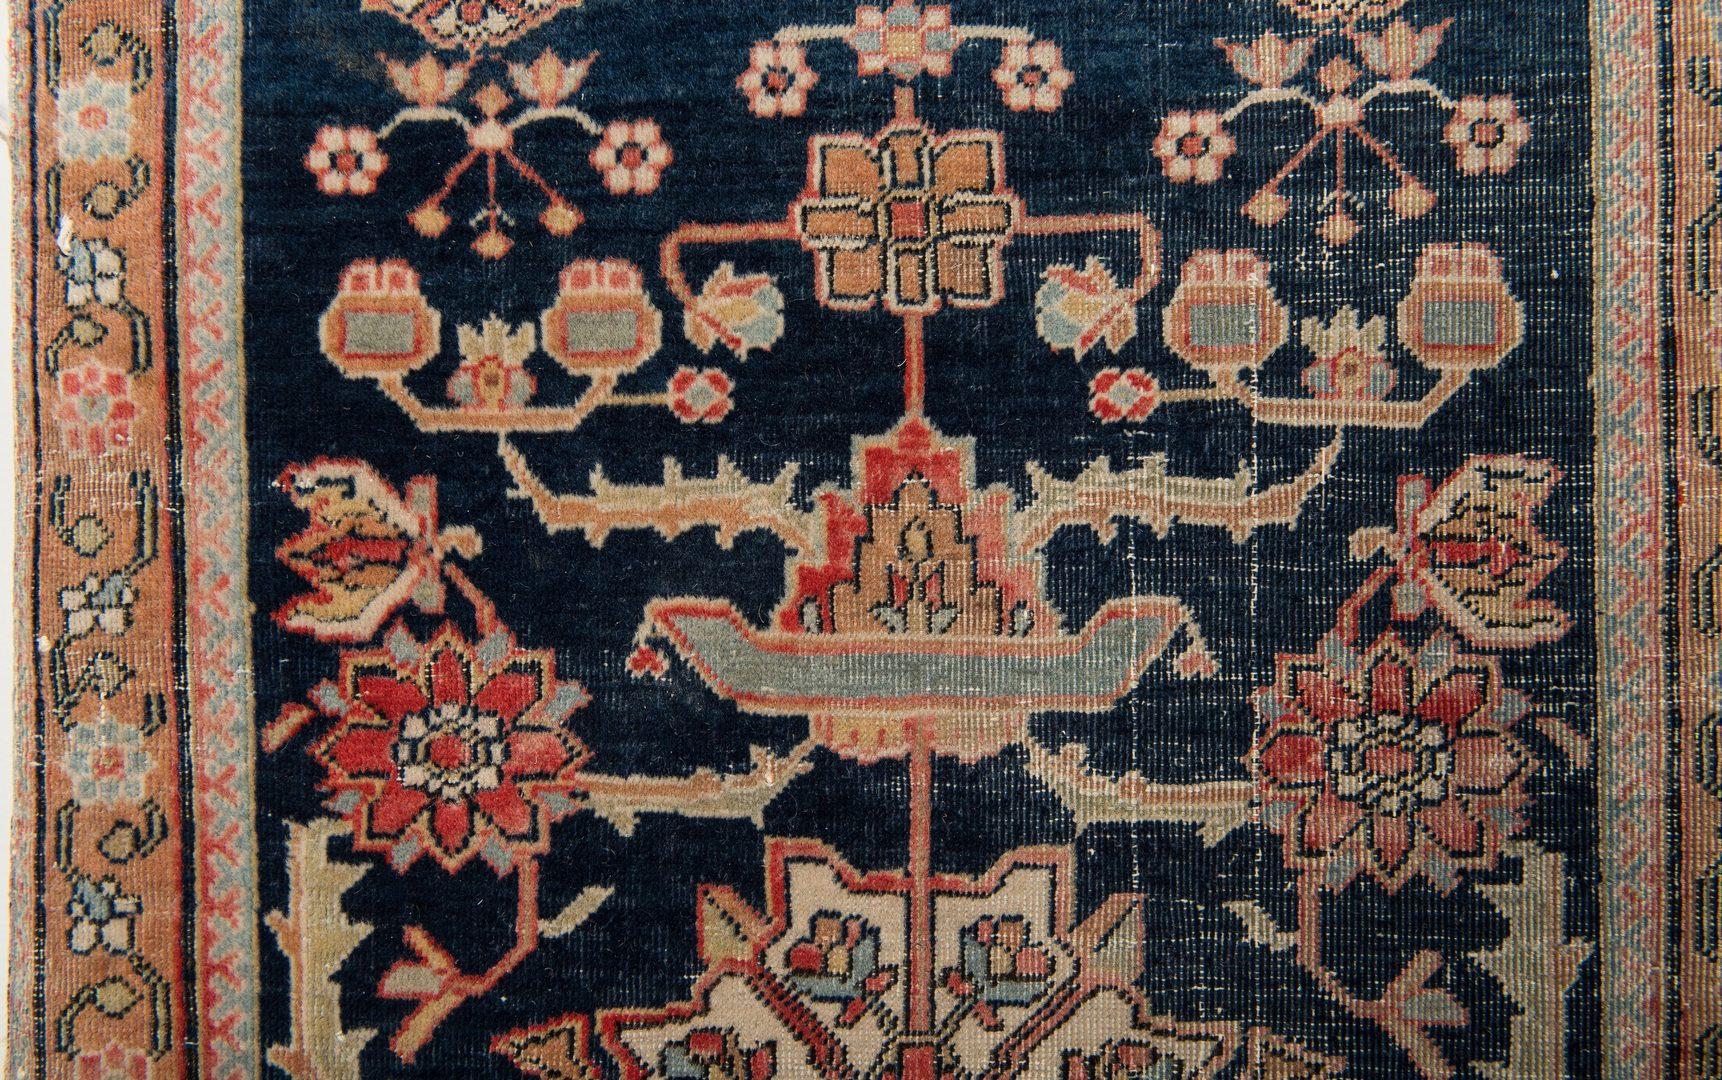 Lot 315: Antique Persian Mohtasham Kashan